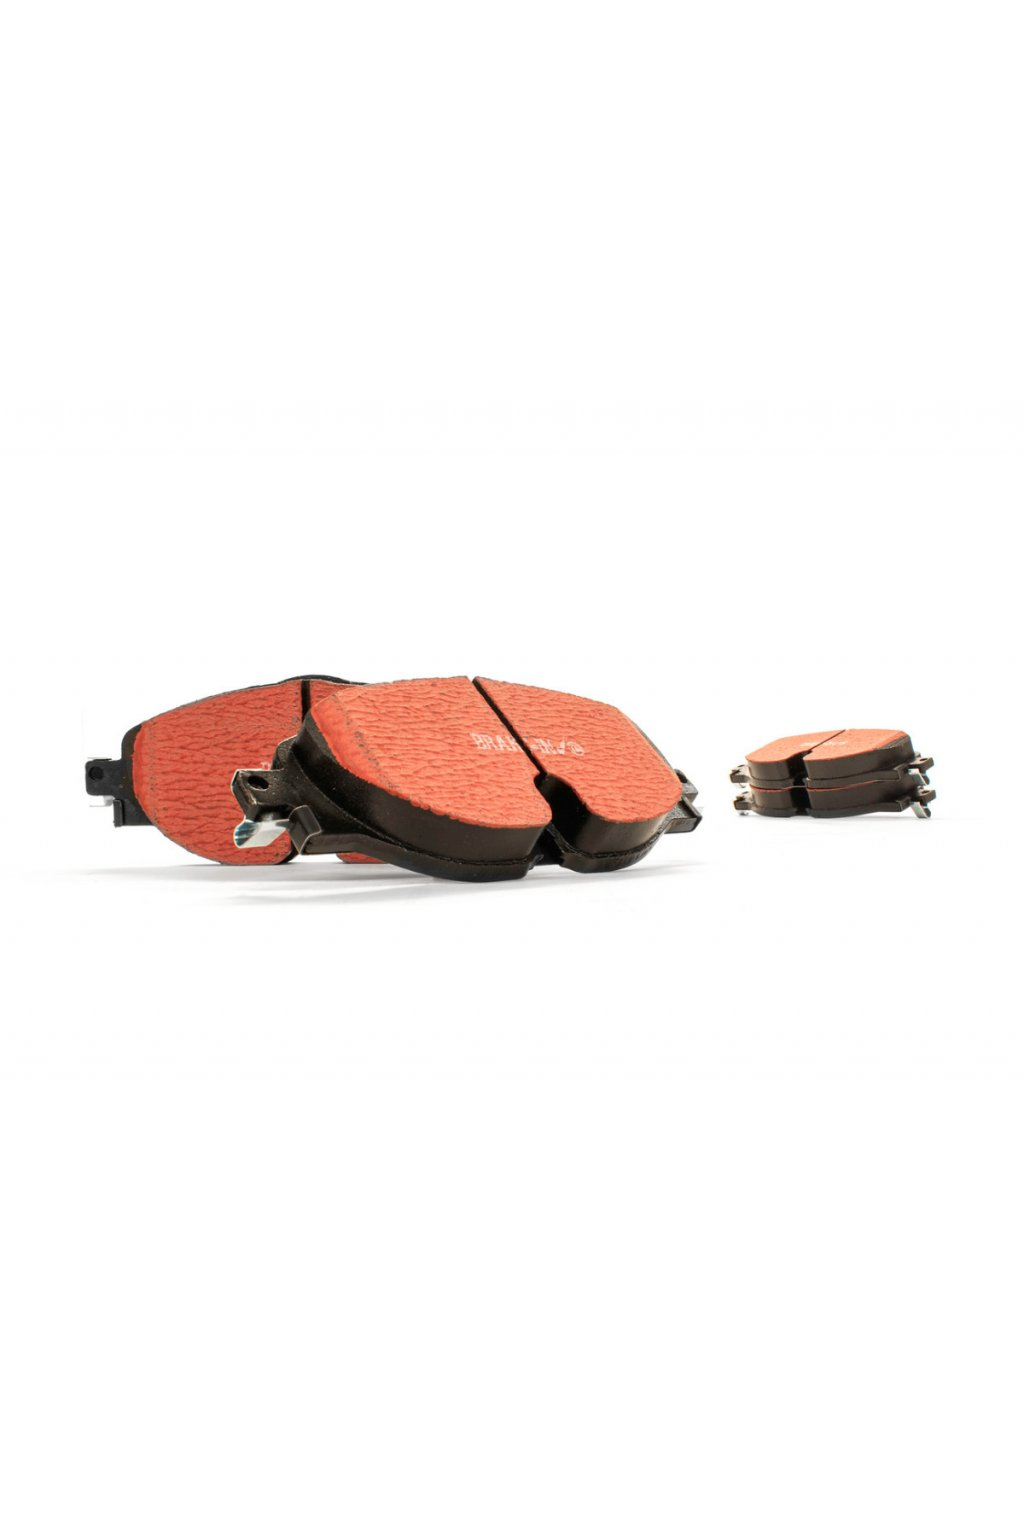 racingline performance predni brzdove desky rp700 pro vozy platformy mqb s kotouci 312 x 25 mm 2020115151956